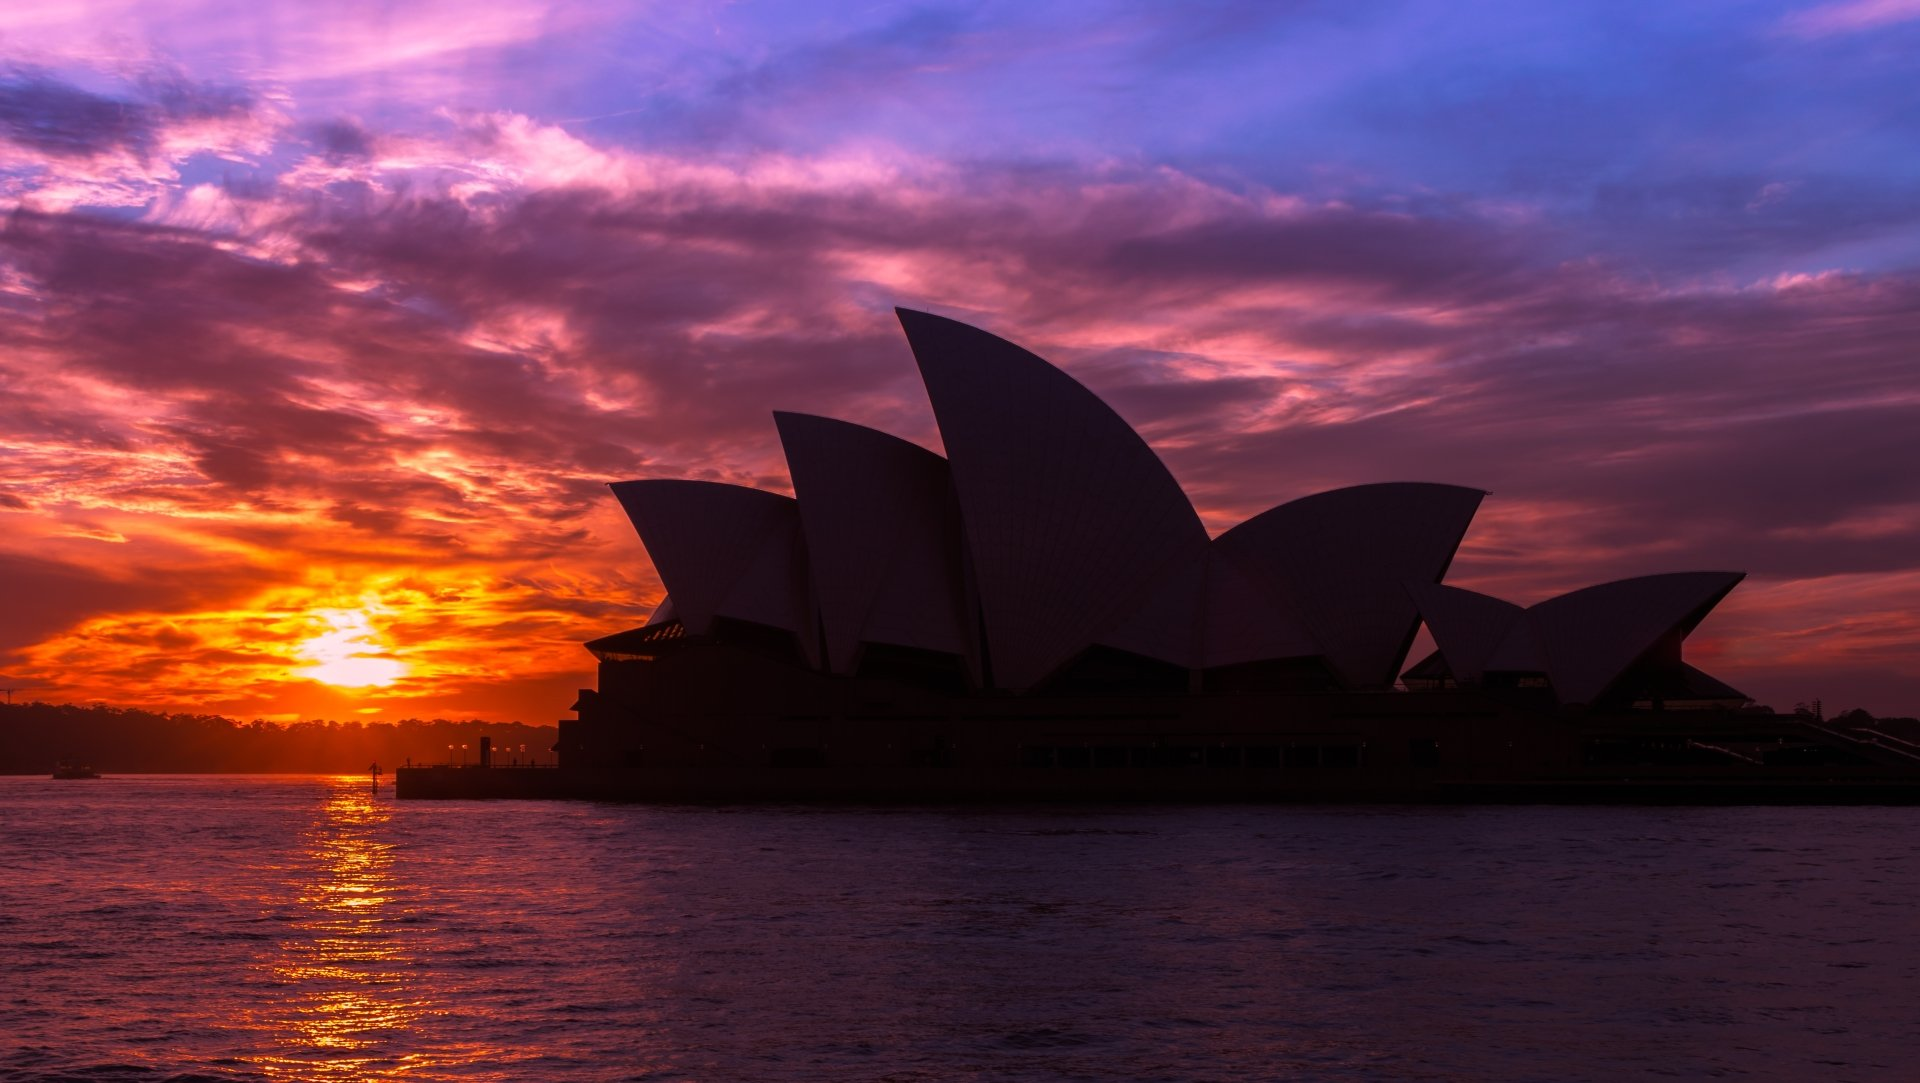 Opera House Backgrounds